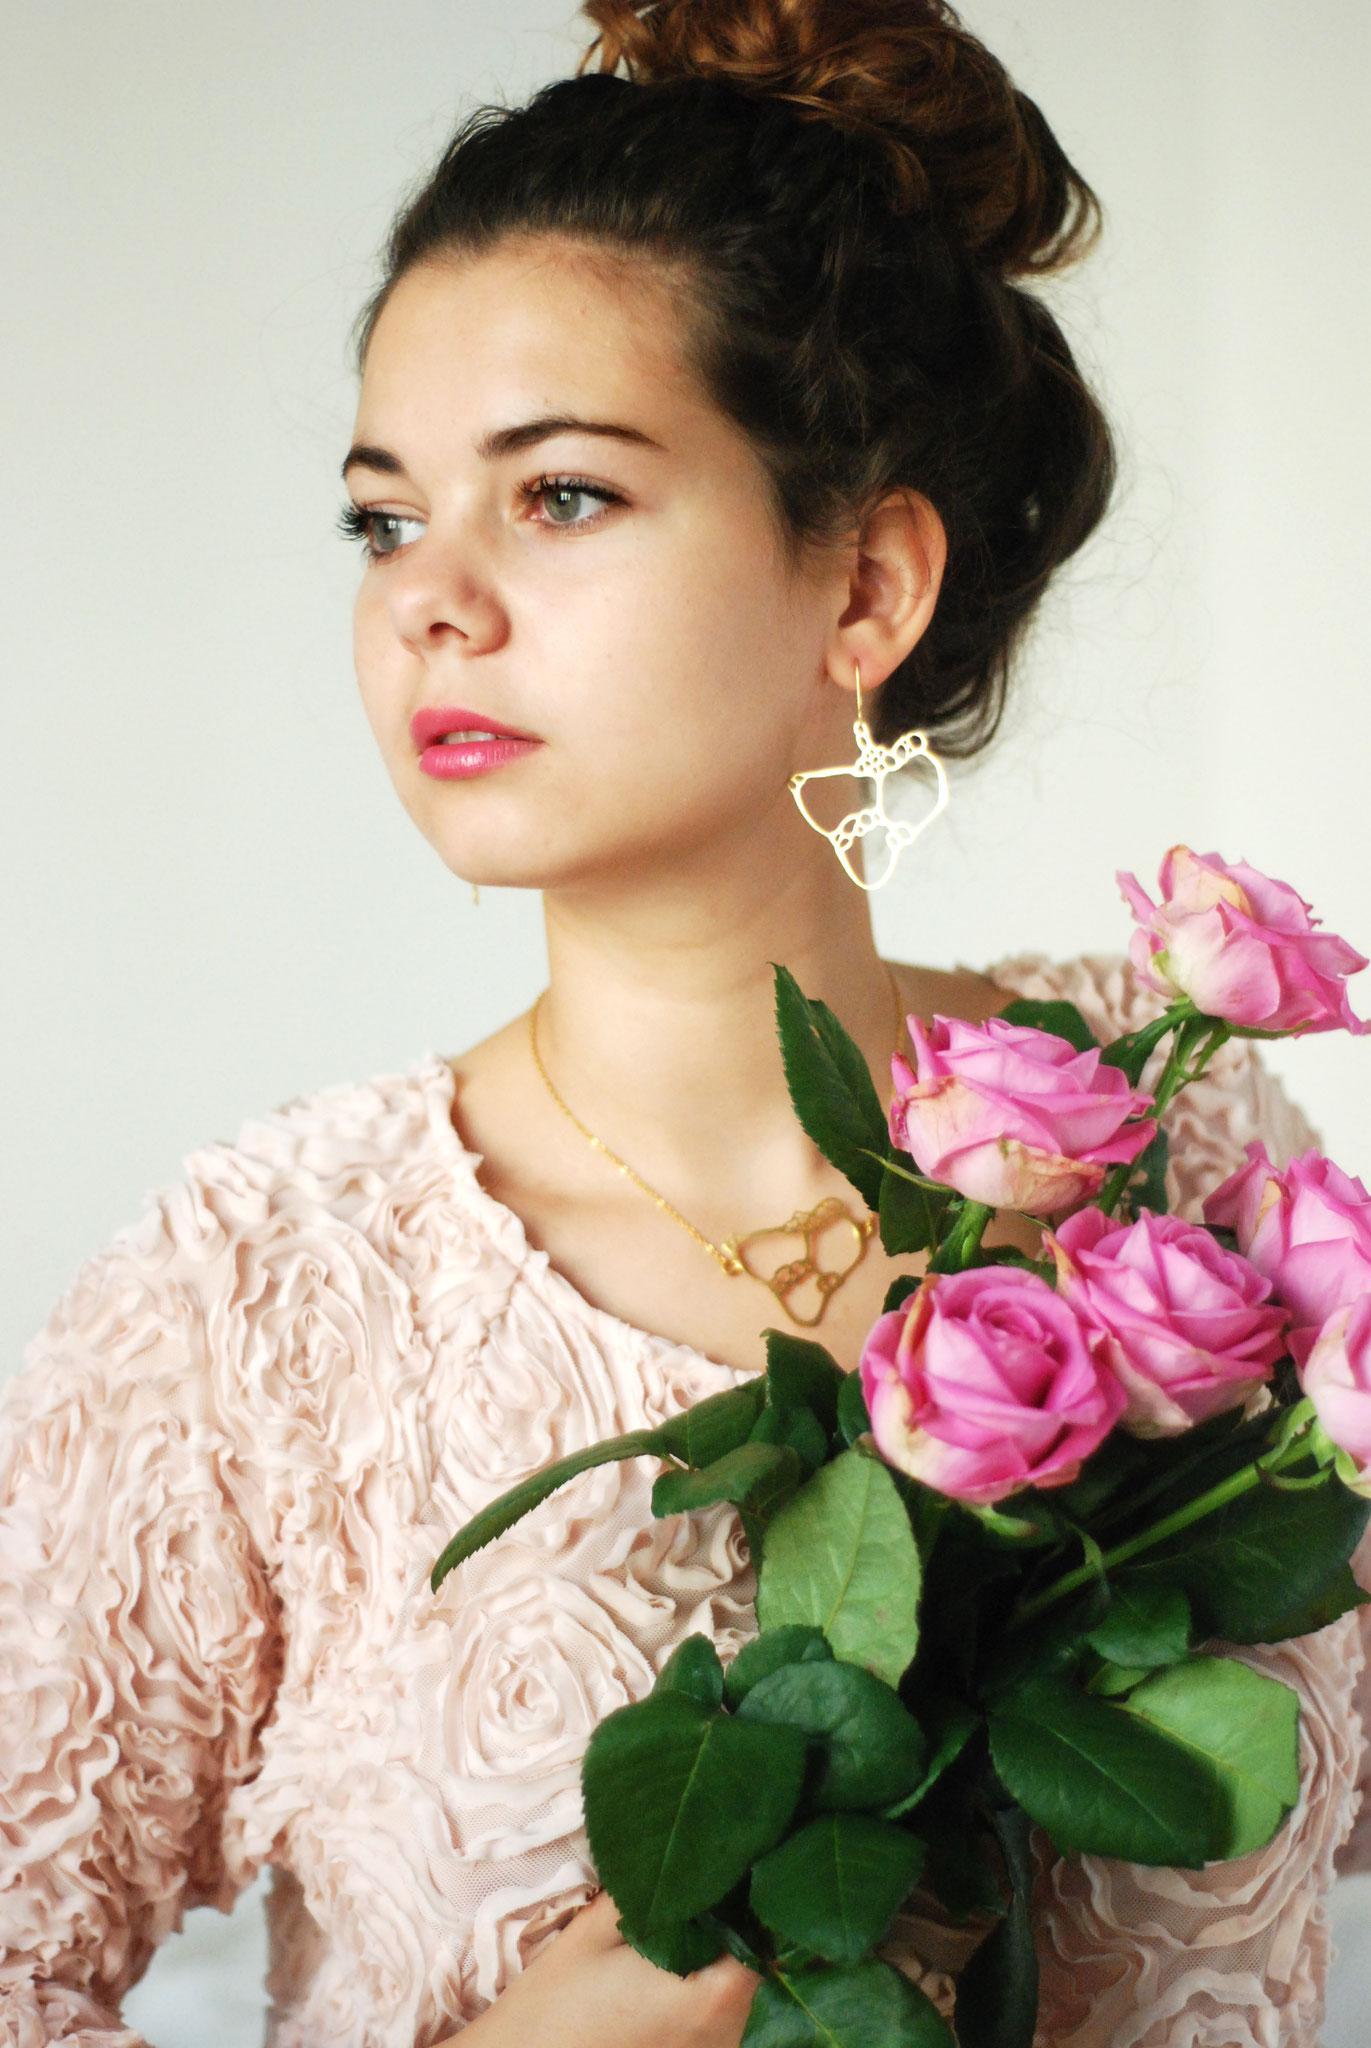 Blog KItsch is my middle name./Photographe : Erwan ; Modèle : Juliette